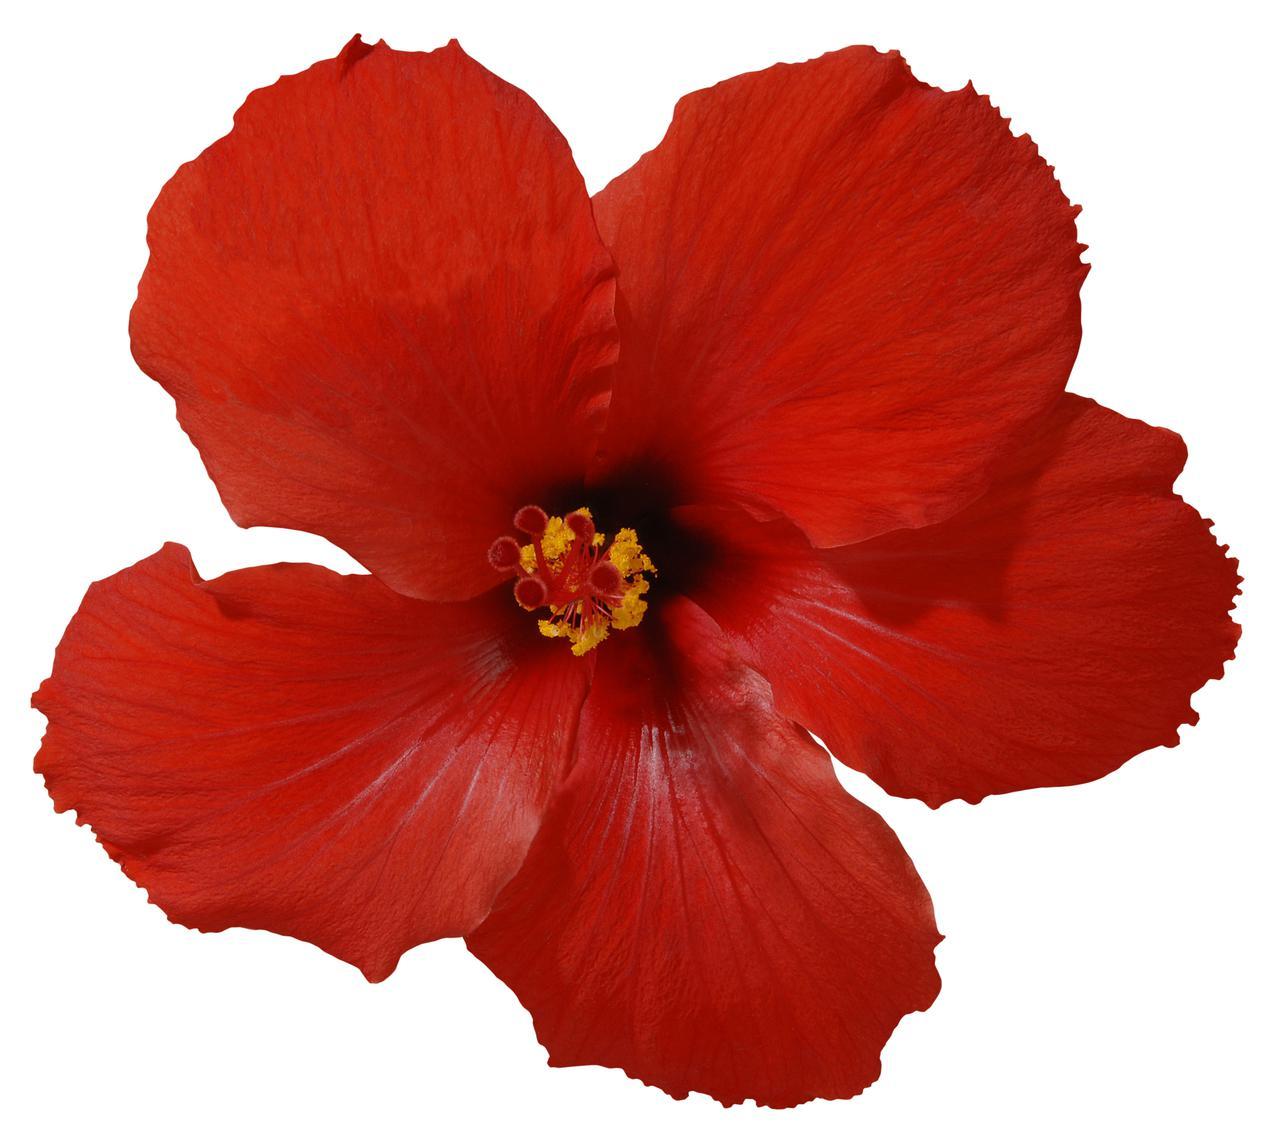 website-review-images/iStock-172180673 (Hibiscus).jpg